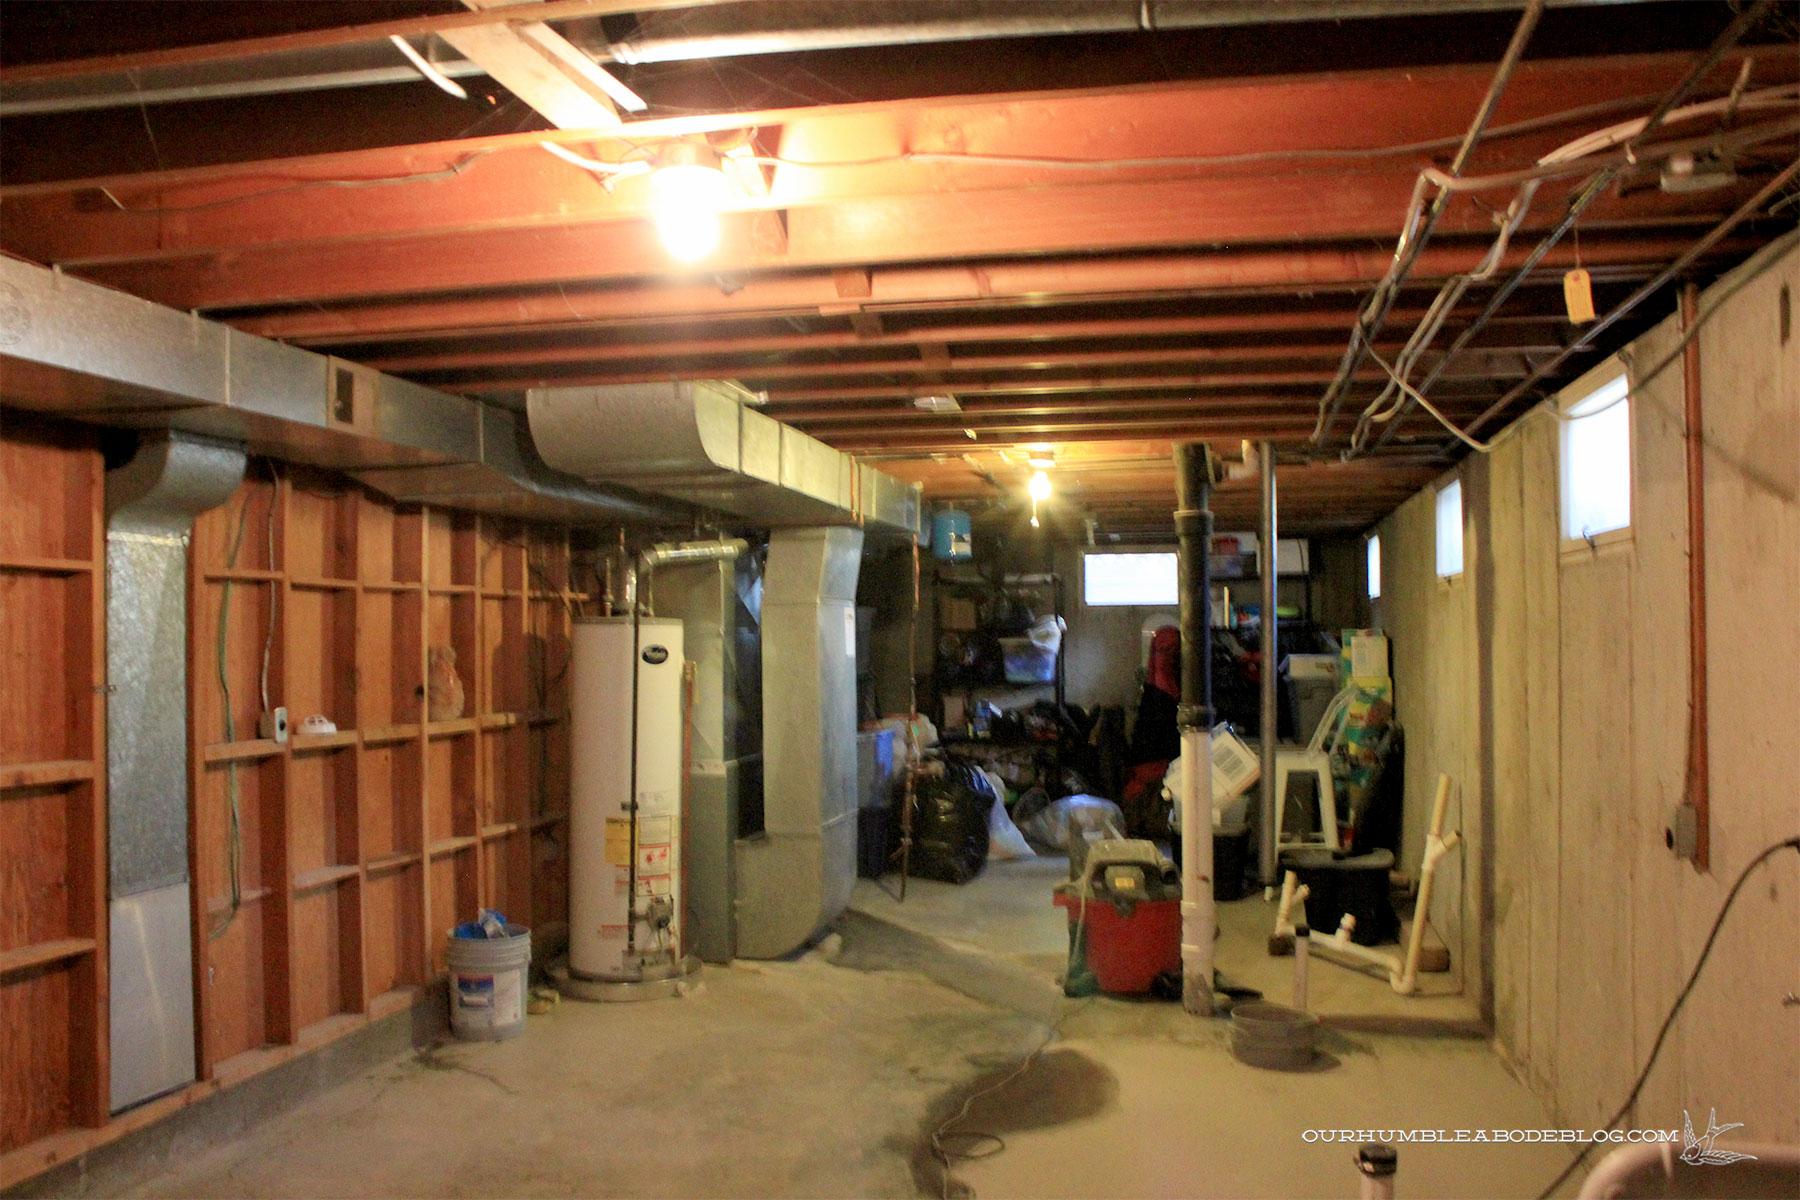 Basement-Before-Toward-Bedroom-Space